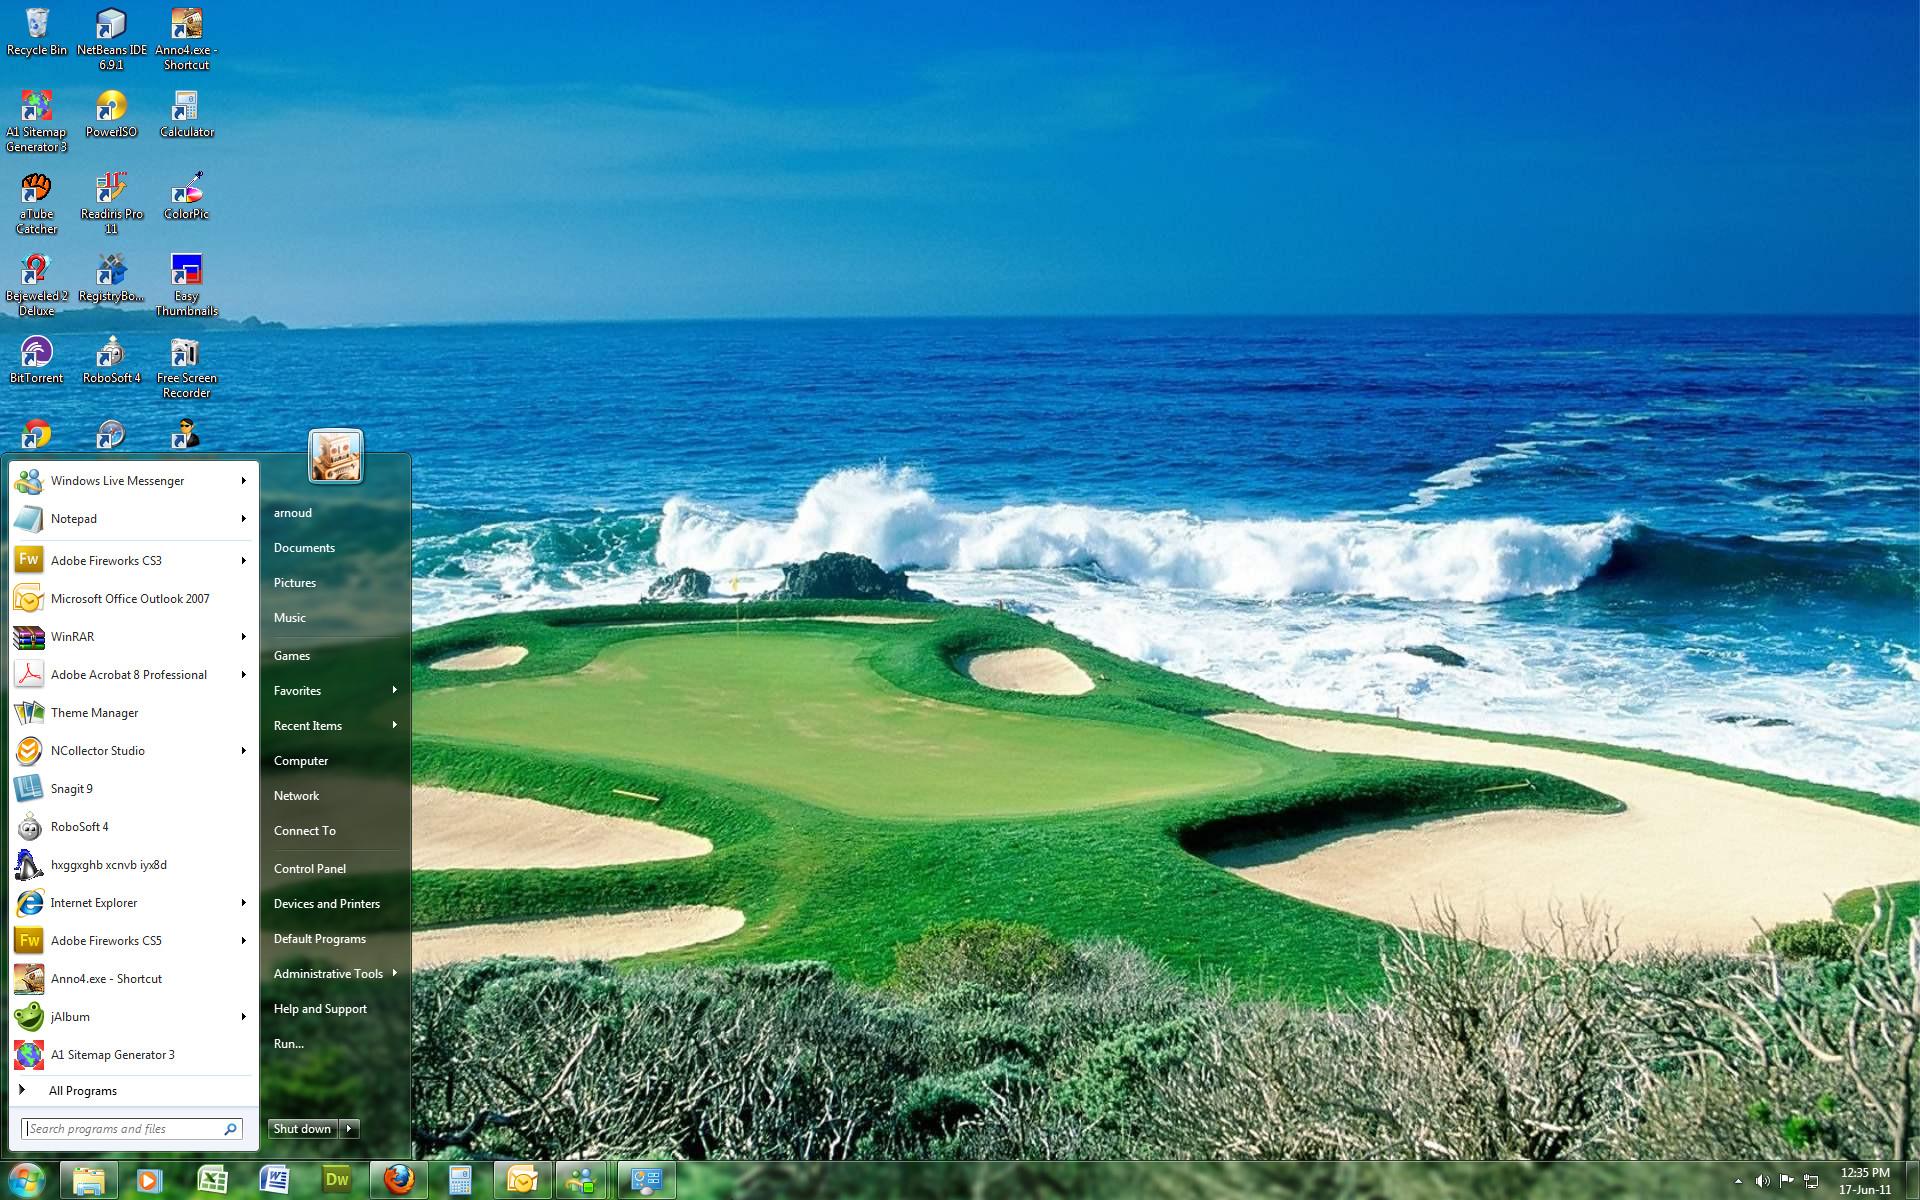 Windows 7 Themes   Windows 7 Theme – US Open Golf by *Windowsthememanager  on deviantART